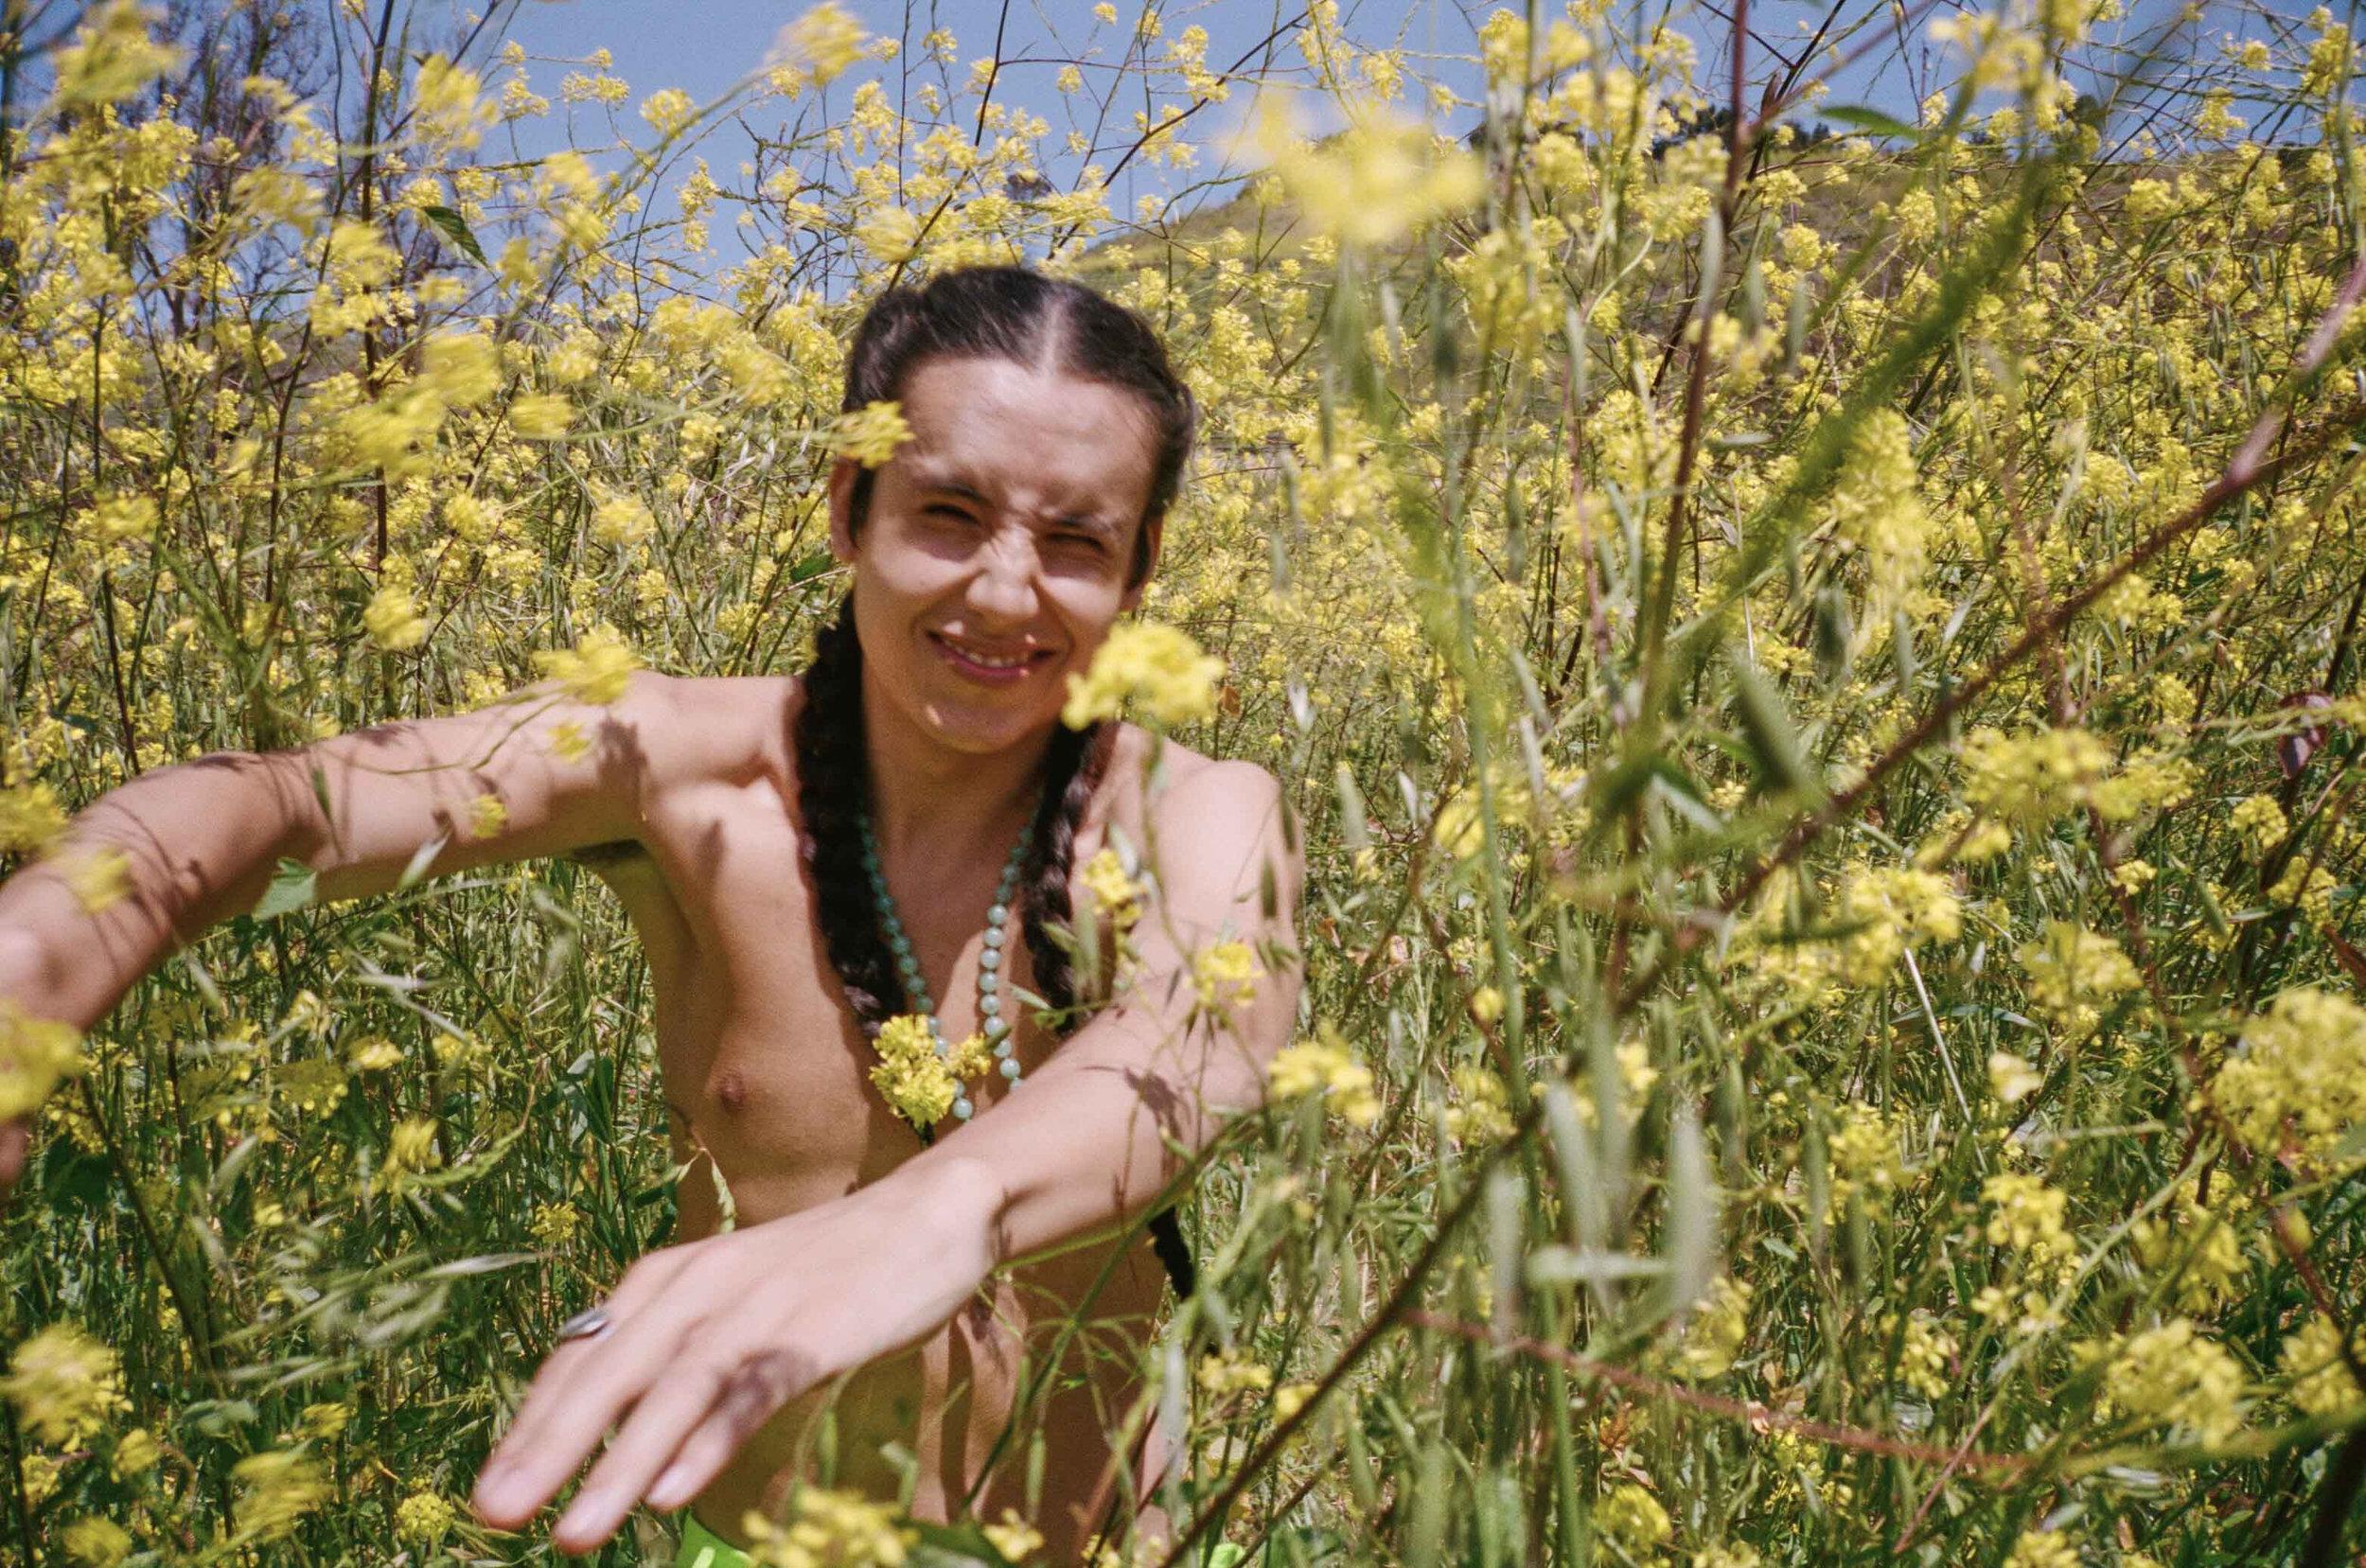 SOLAR 07 | Magdalena Wosinska - Xiuhtezcatl Martinez  Styling + Commission + Creative Direction